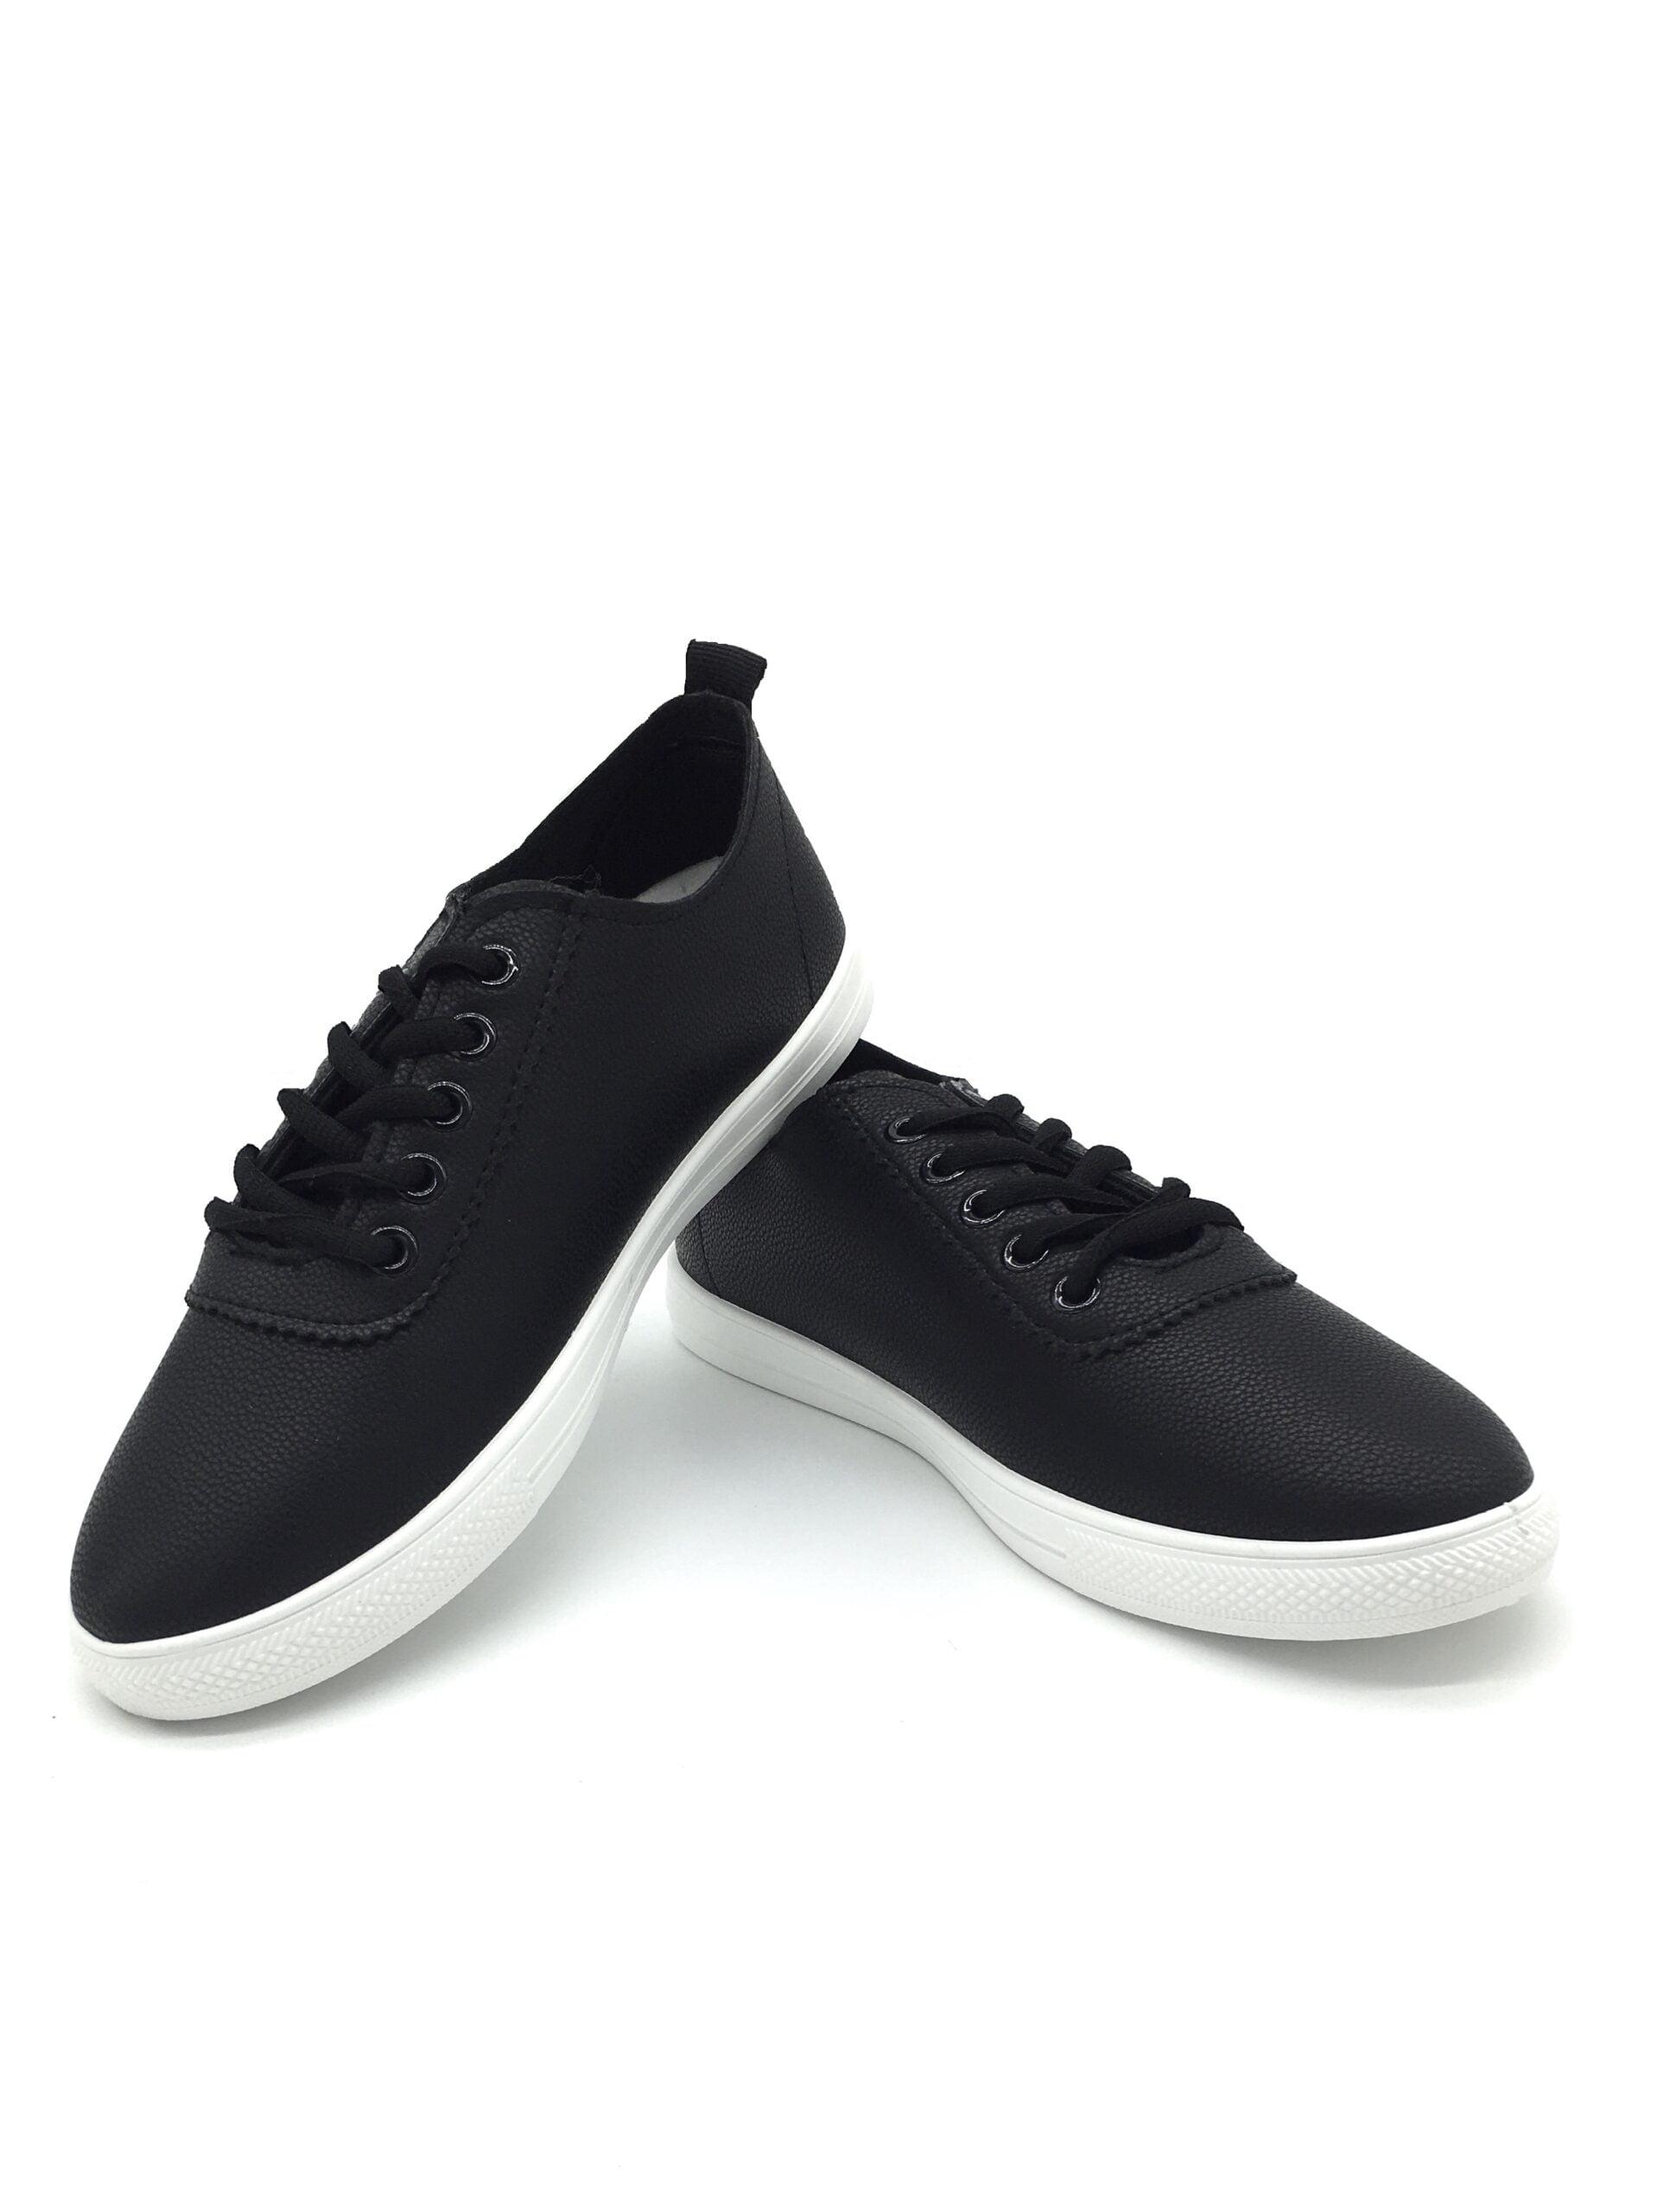 Women's Black Sneakers